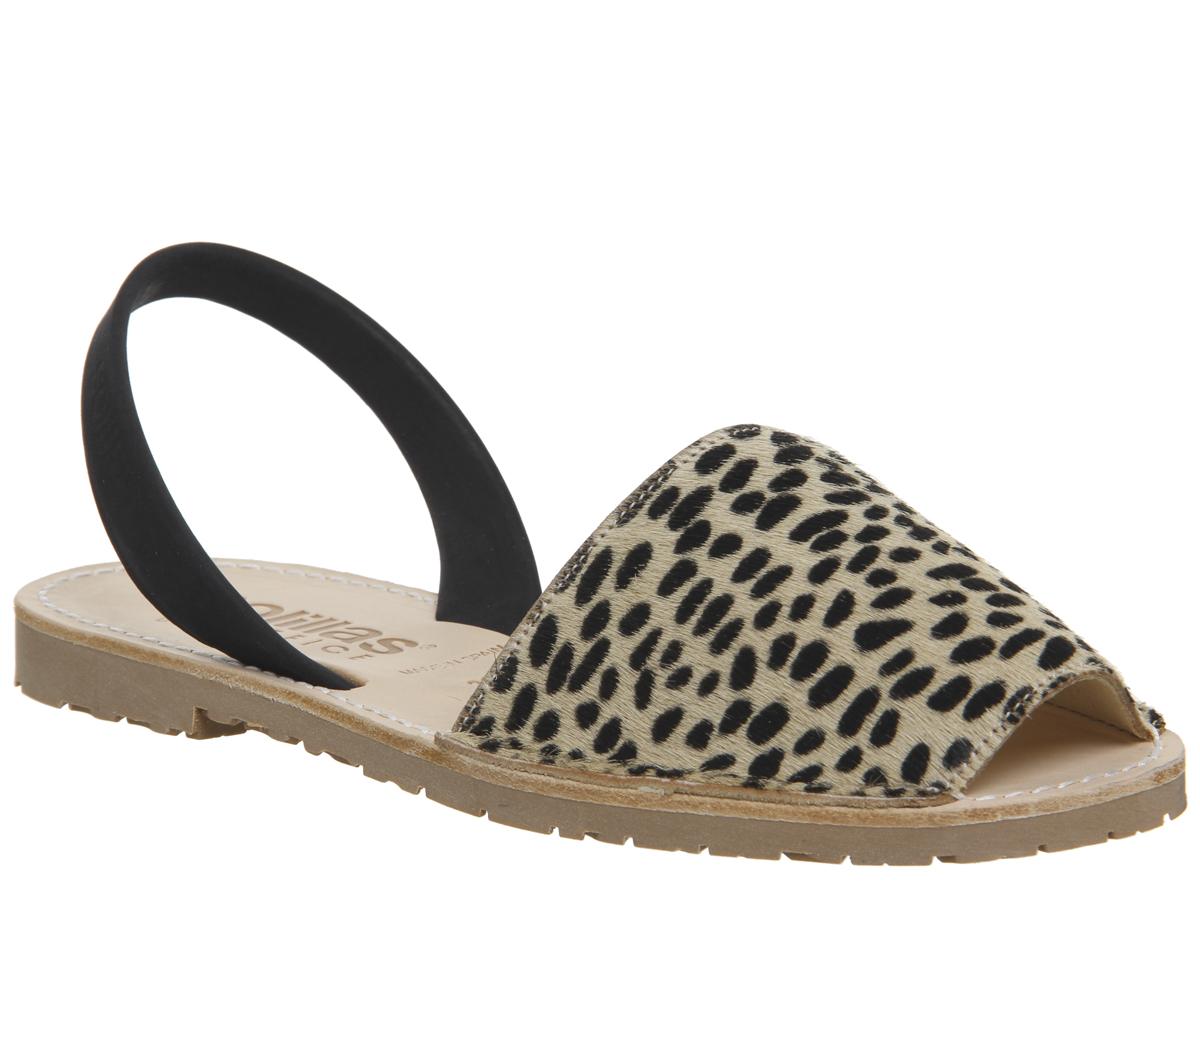 cdacd29db720 Sentinel Womens Solillas Solillas Sandals Leopard Black Back Strap Sandals